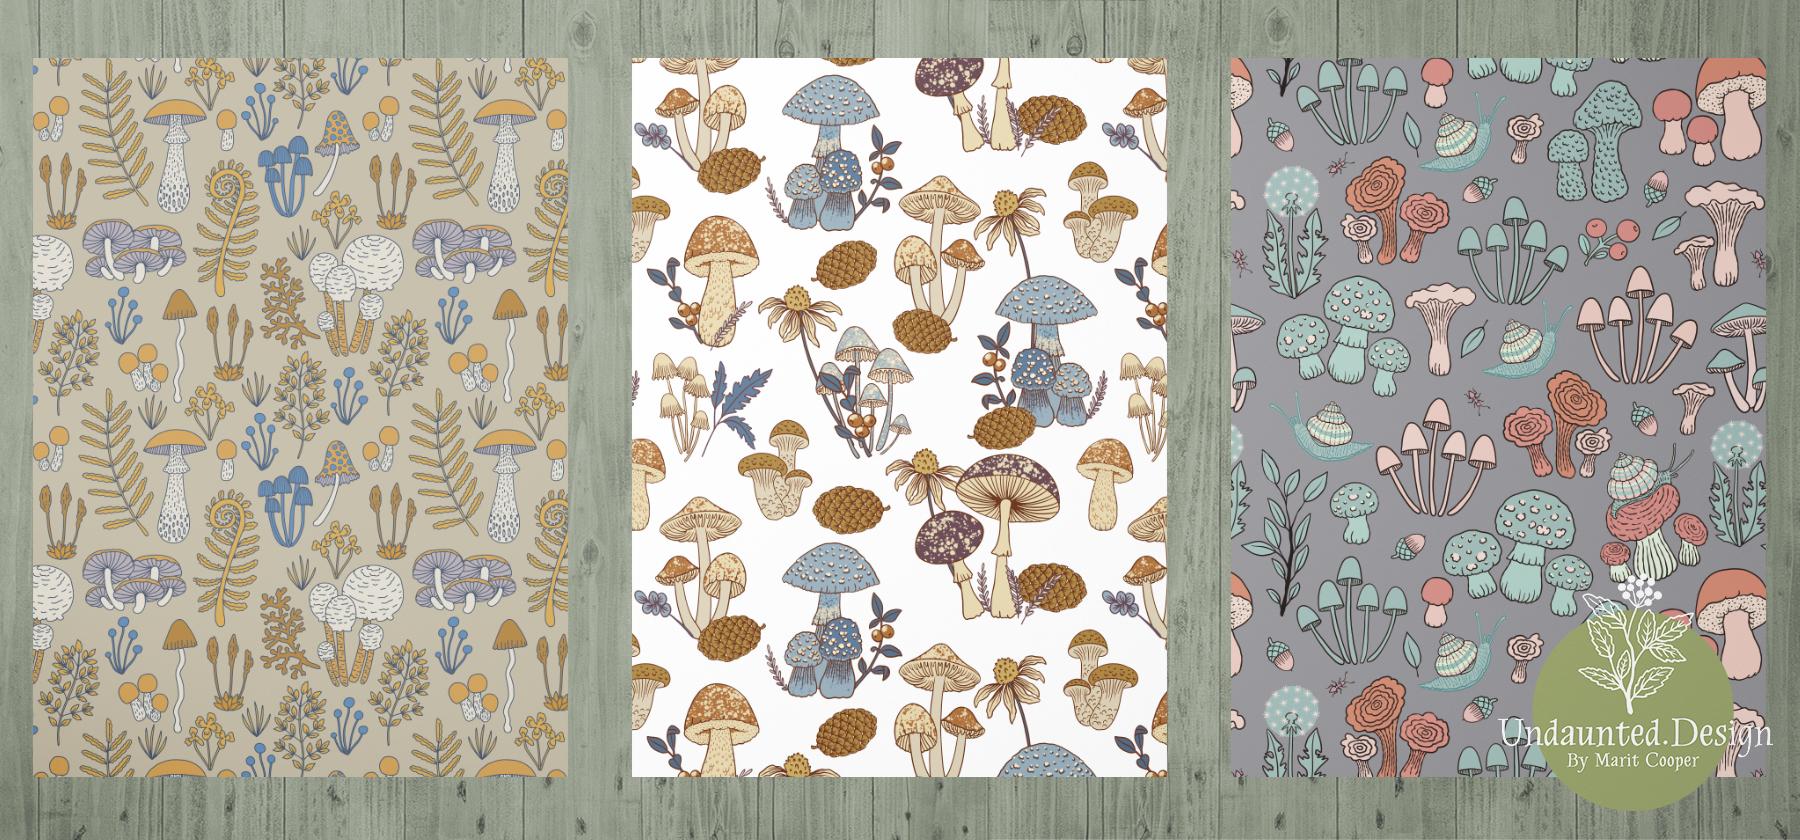 Mushroom Patterns by Marit Cooper